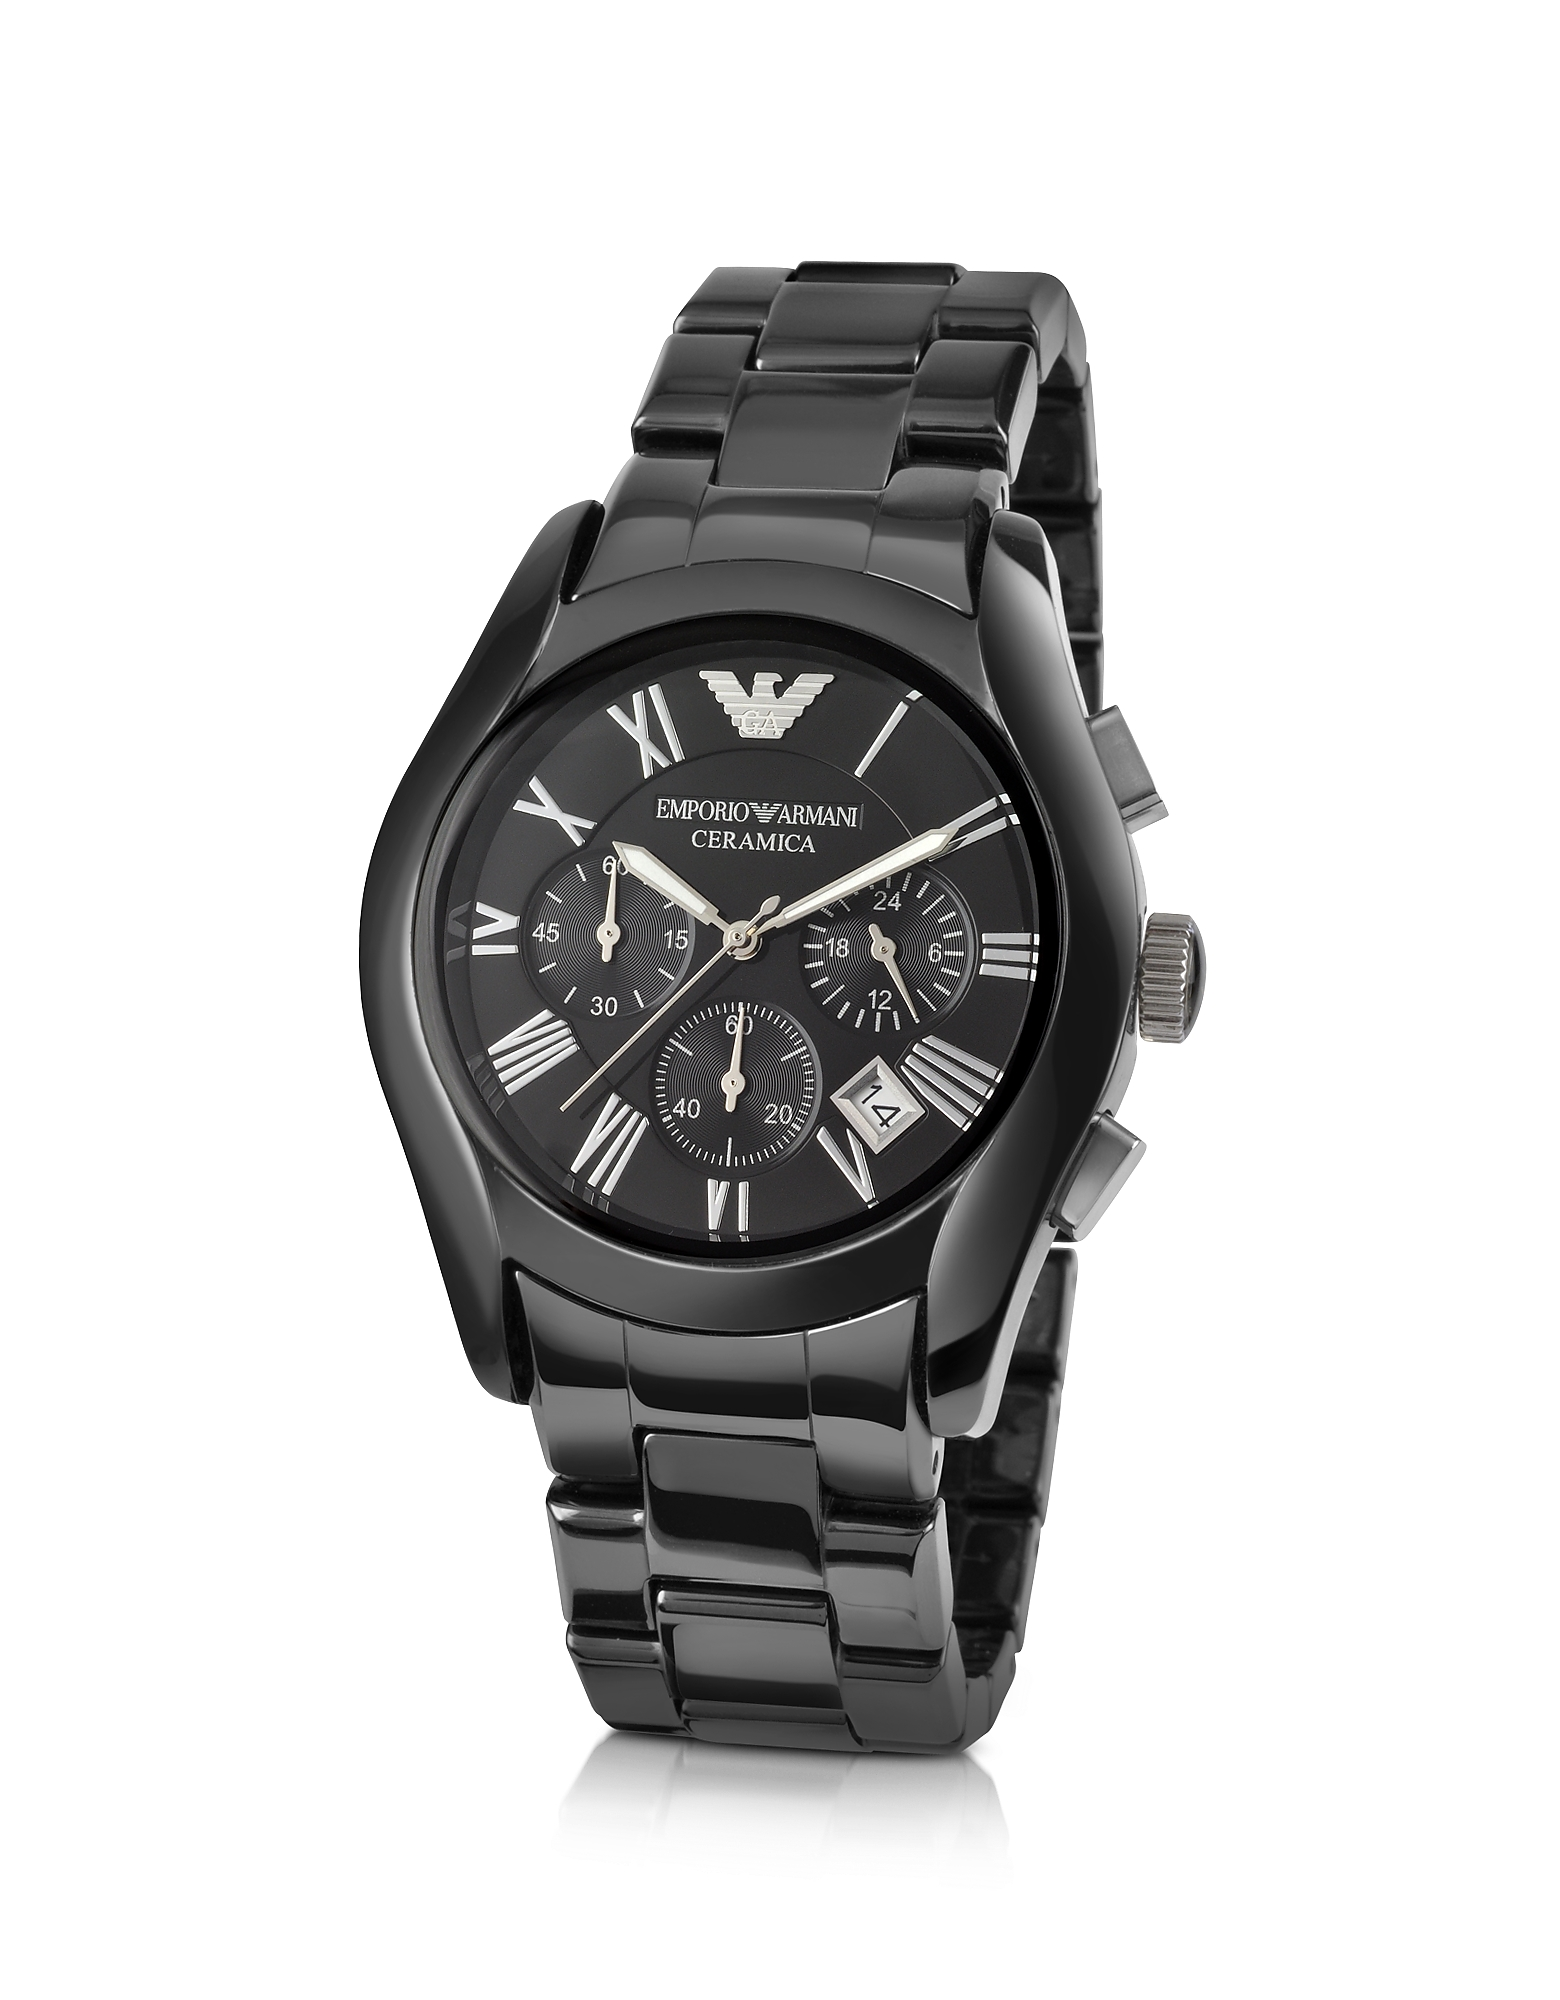 Emporio Armani Men's Watches, Men's Ceramic Chrono Watch